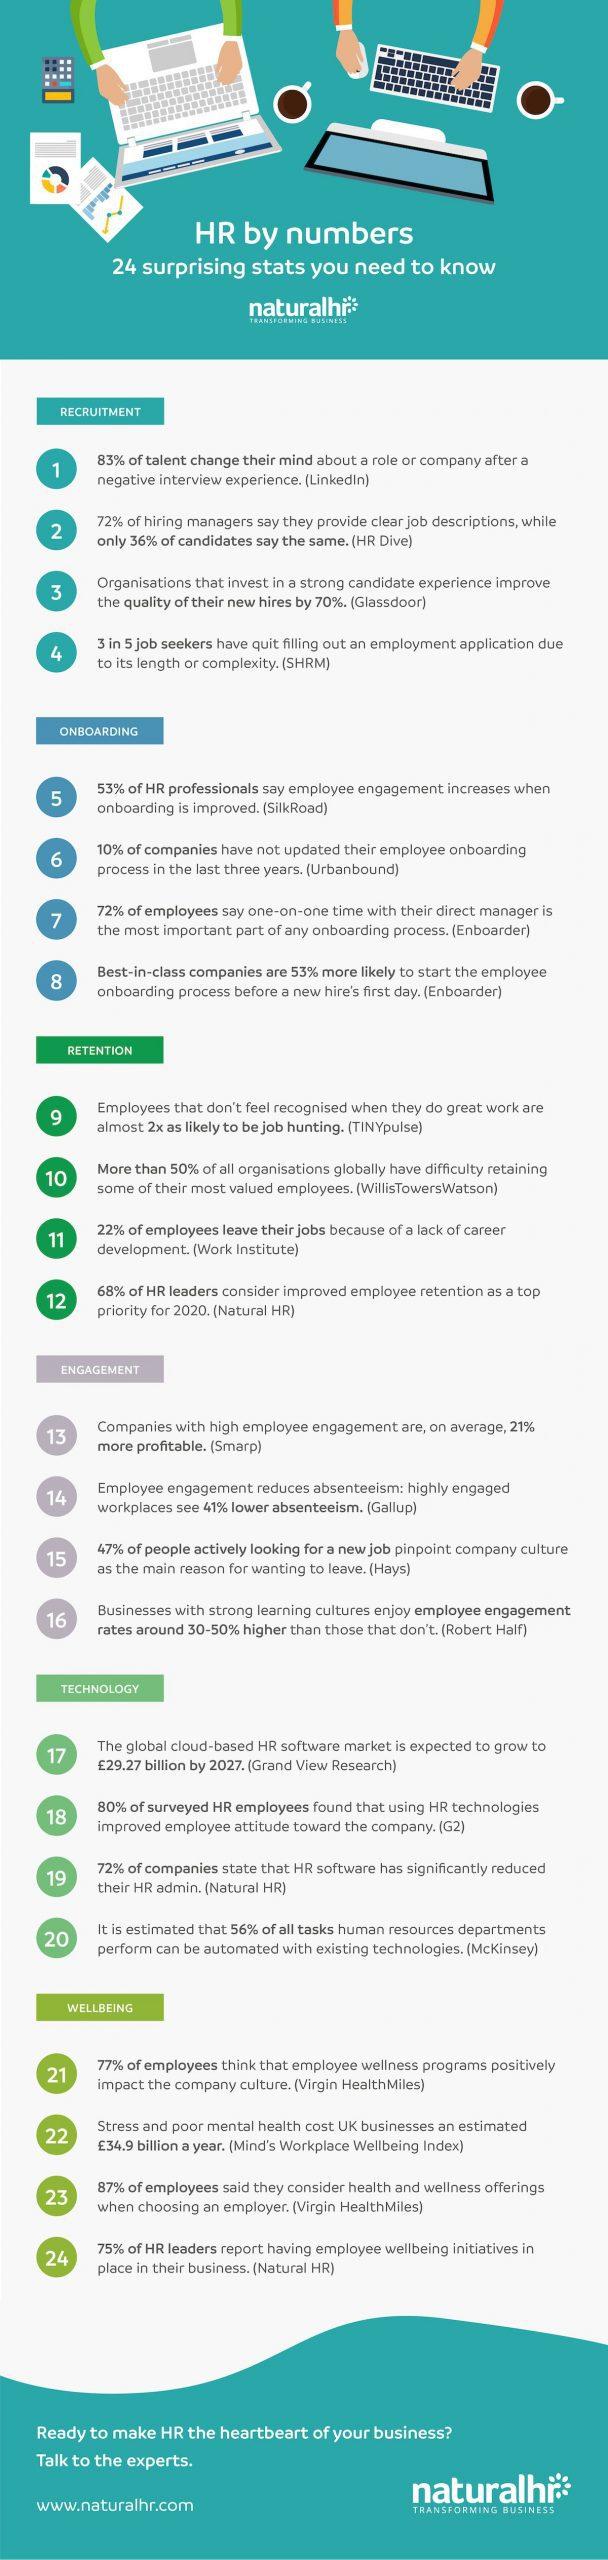 HR stats